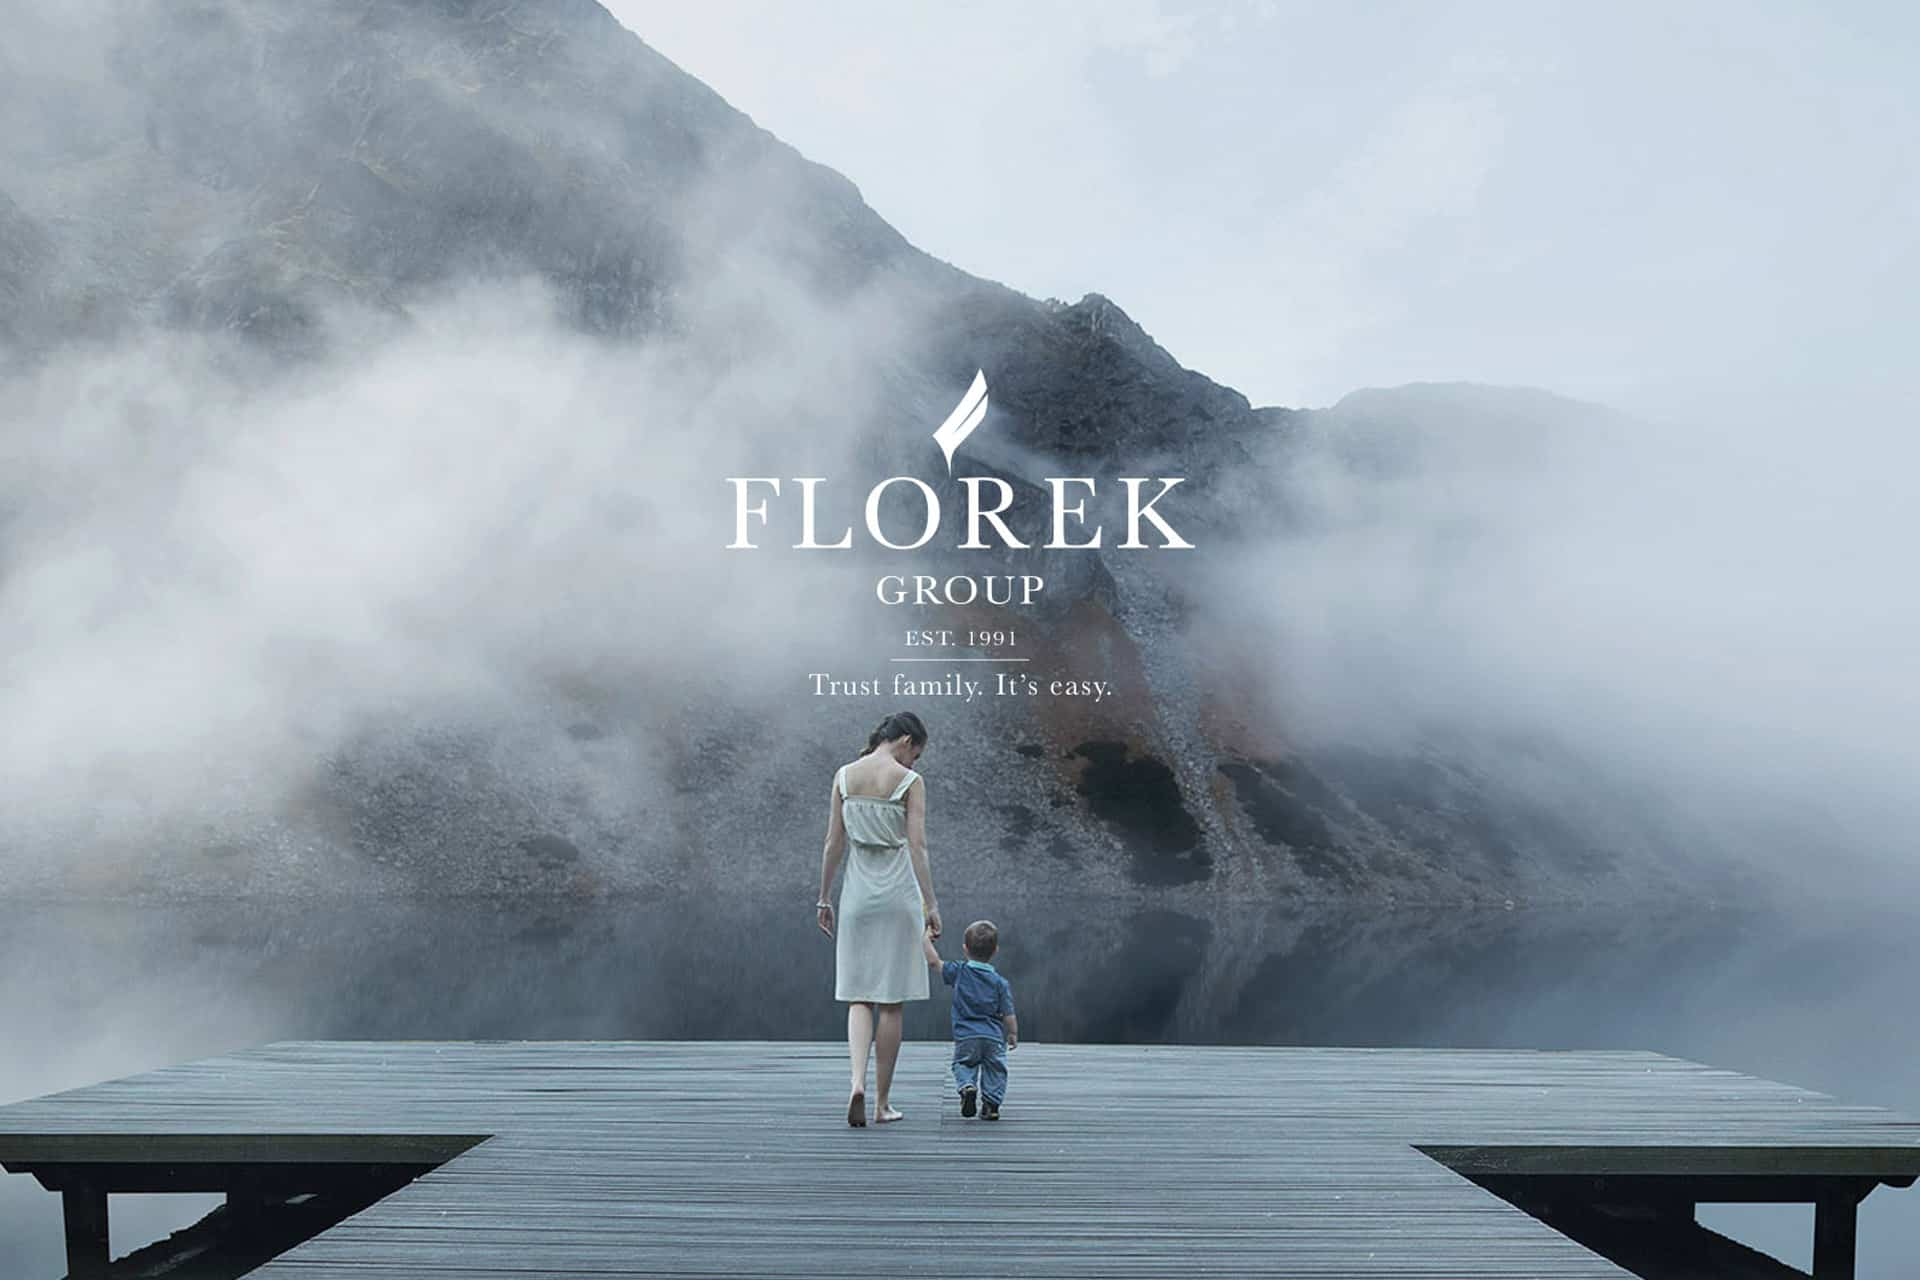 Florek Group